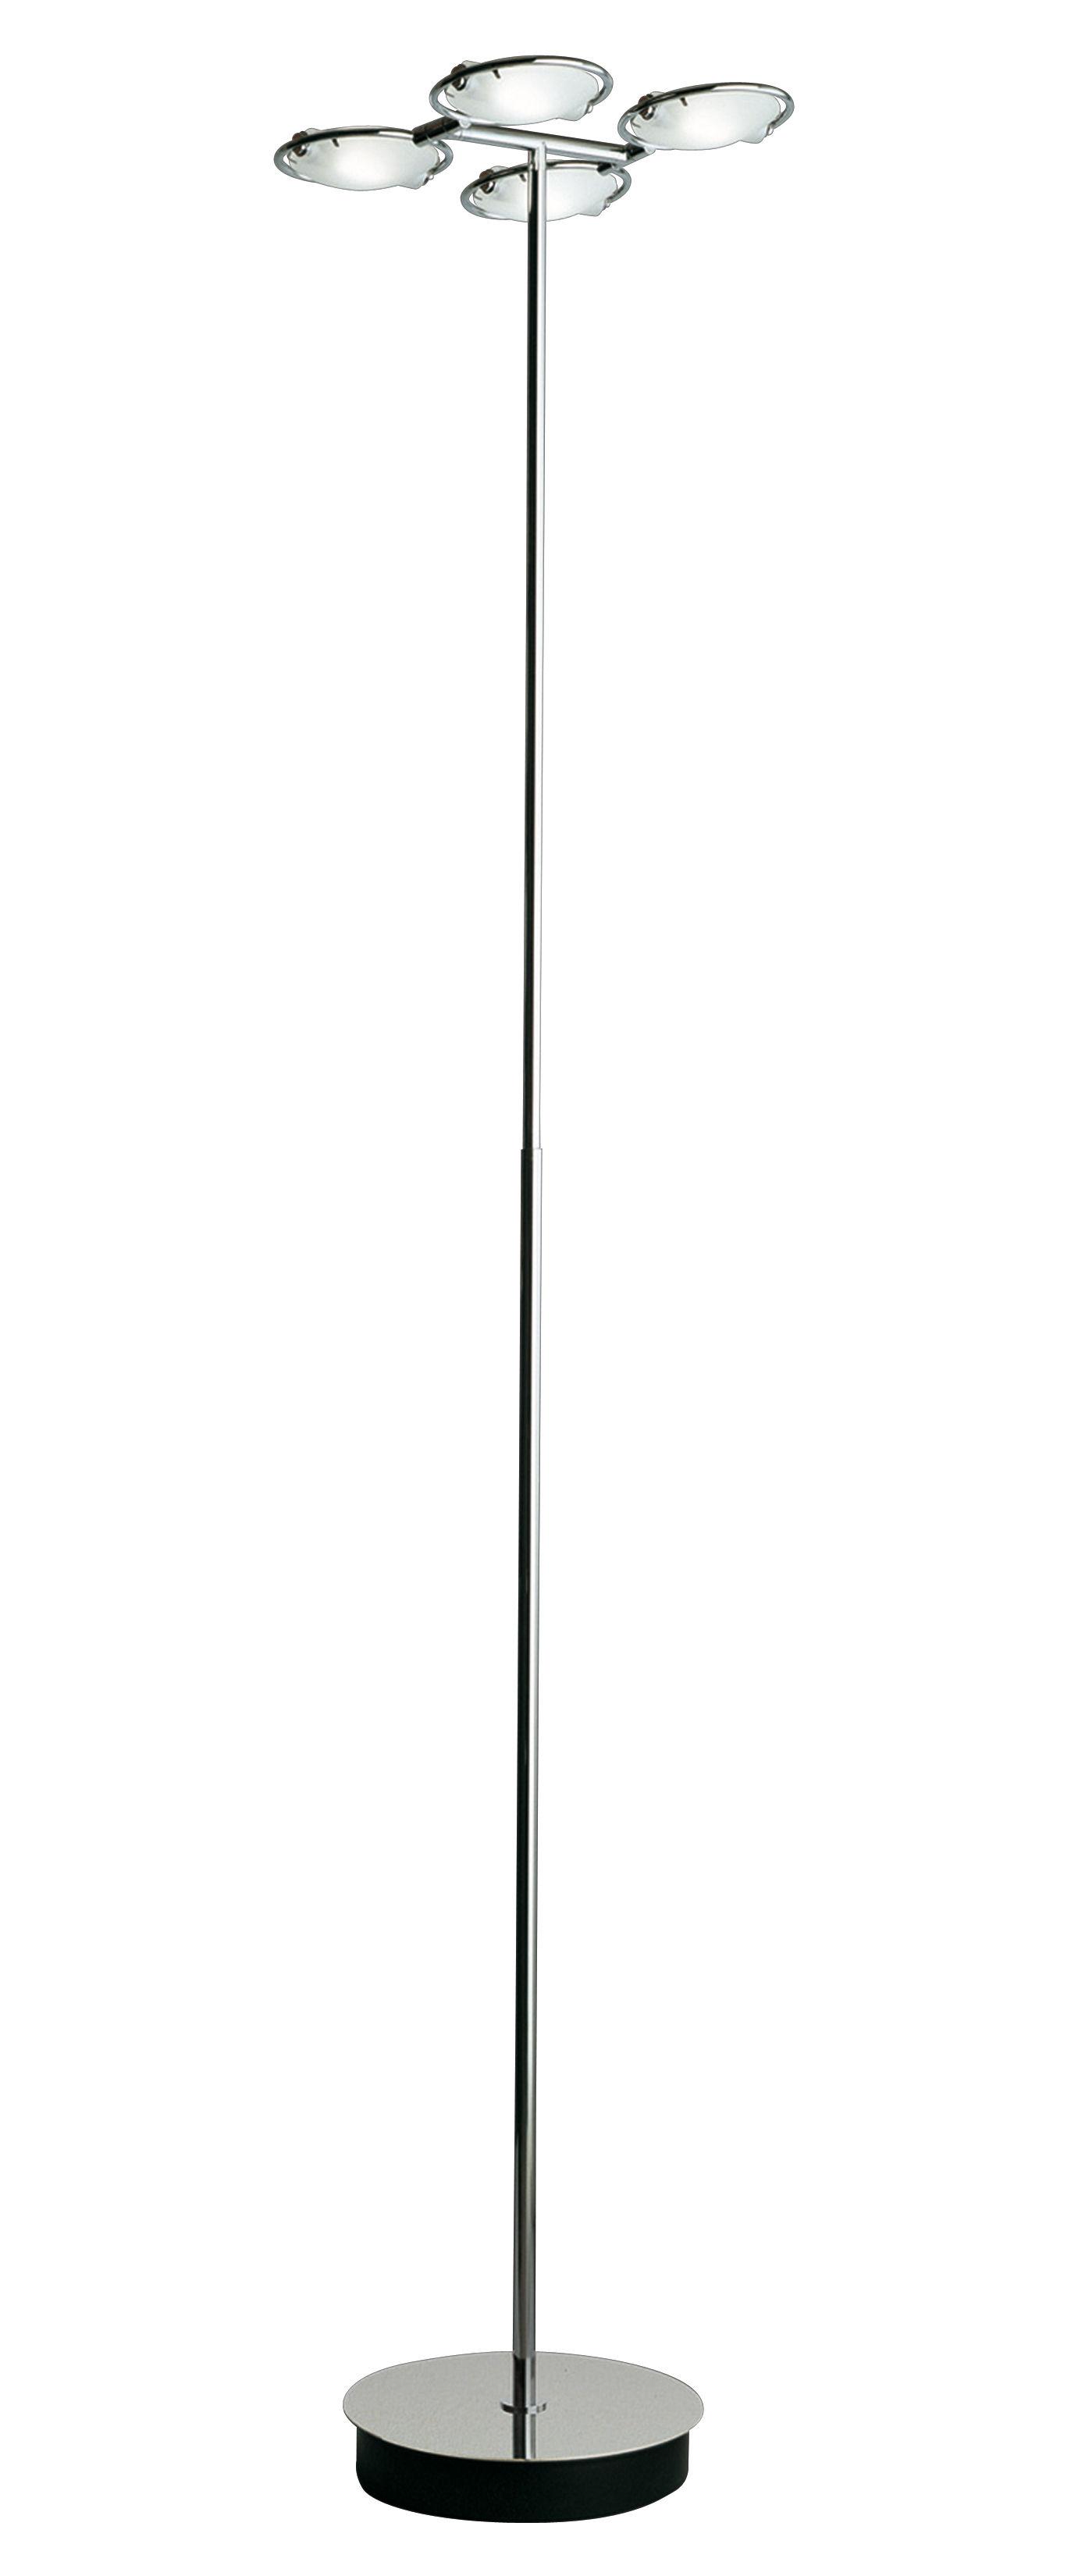 Luminaire - Lampadaires - Lampadaire Nobi 4 diffuseurs - Fontana Arte - Chrome - Métal chromé, Verre